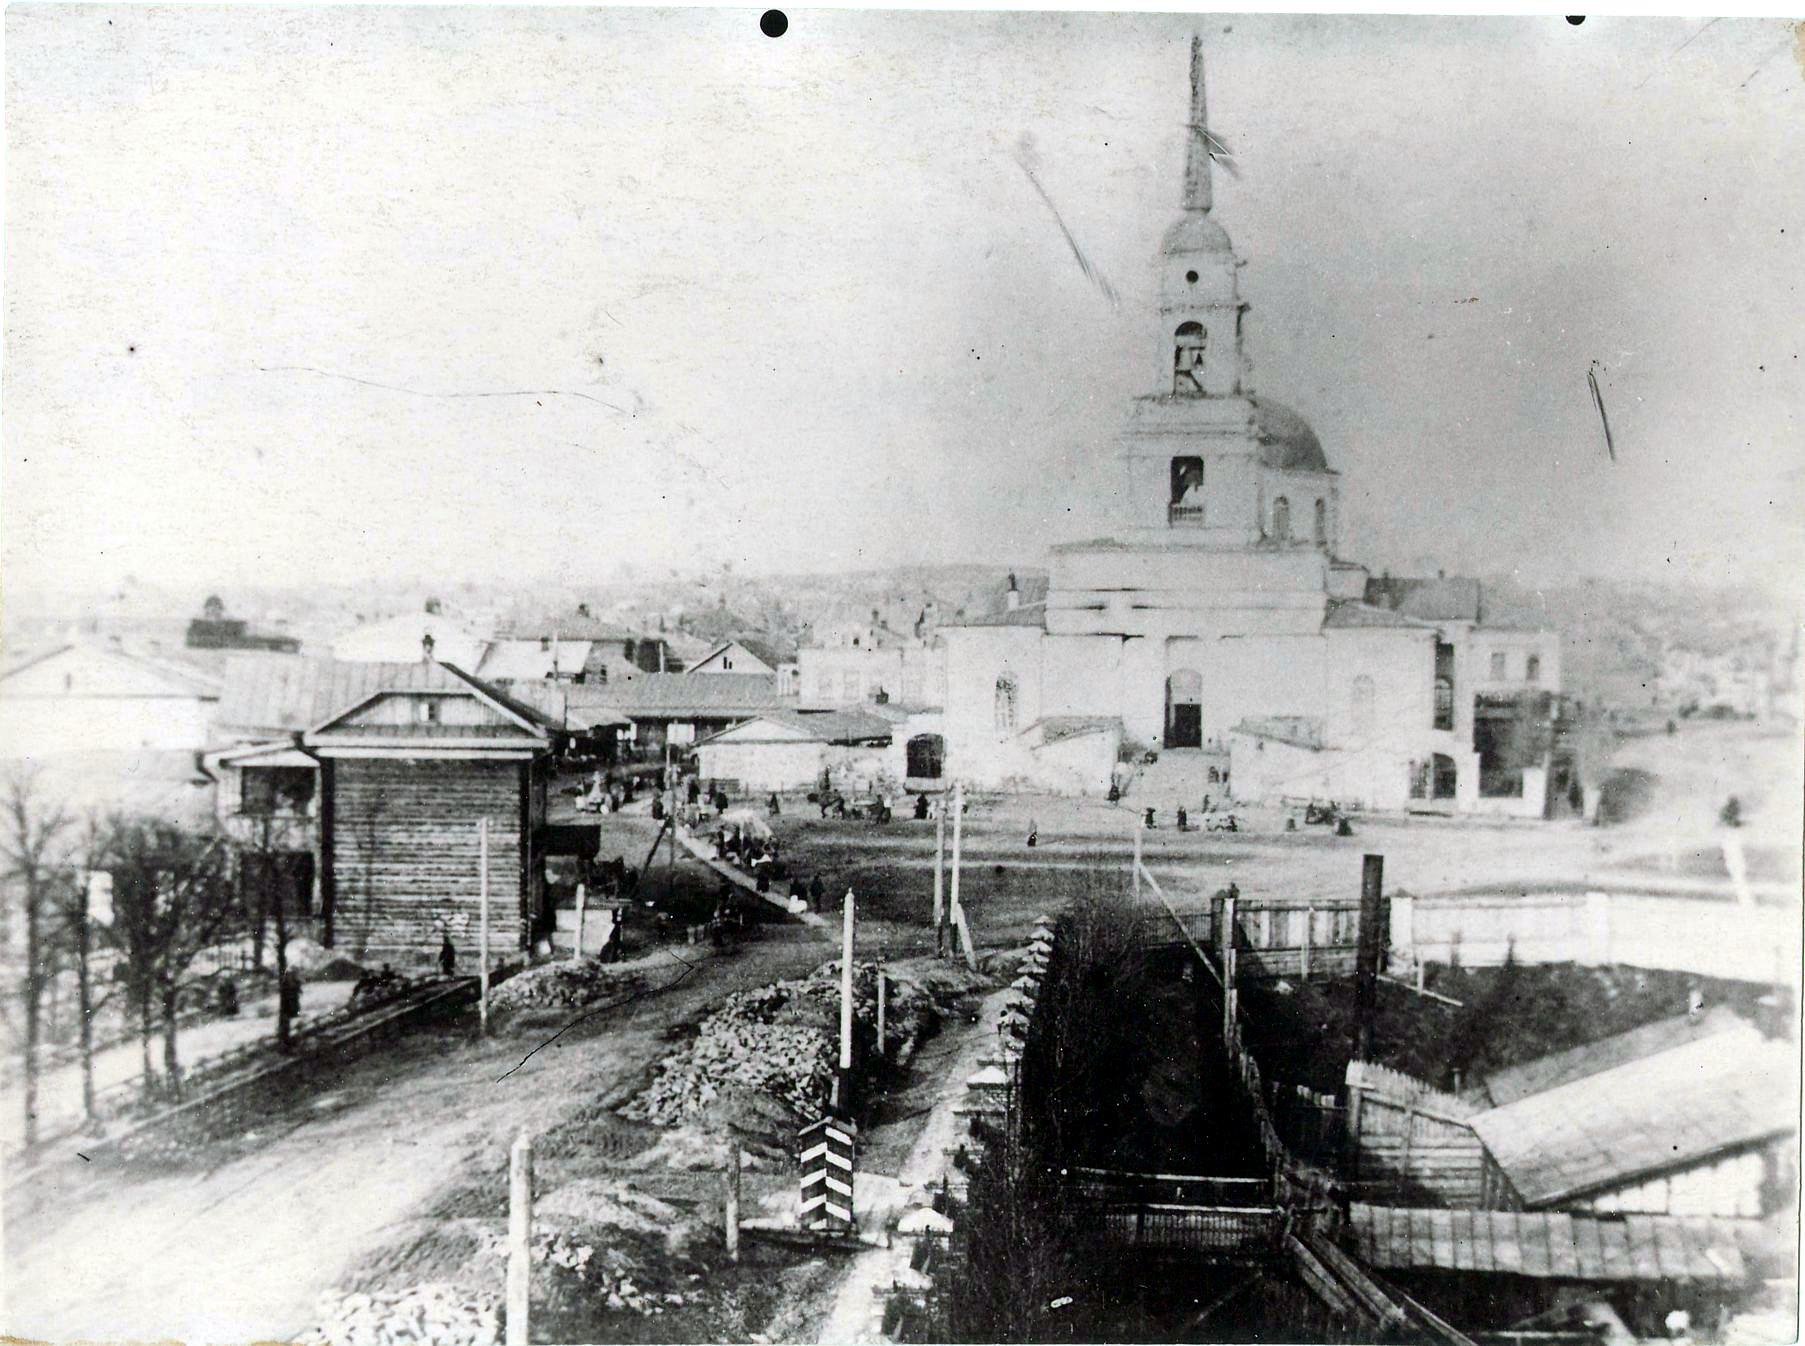 Воткинский завод. Панорама Воткинского завода